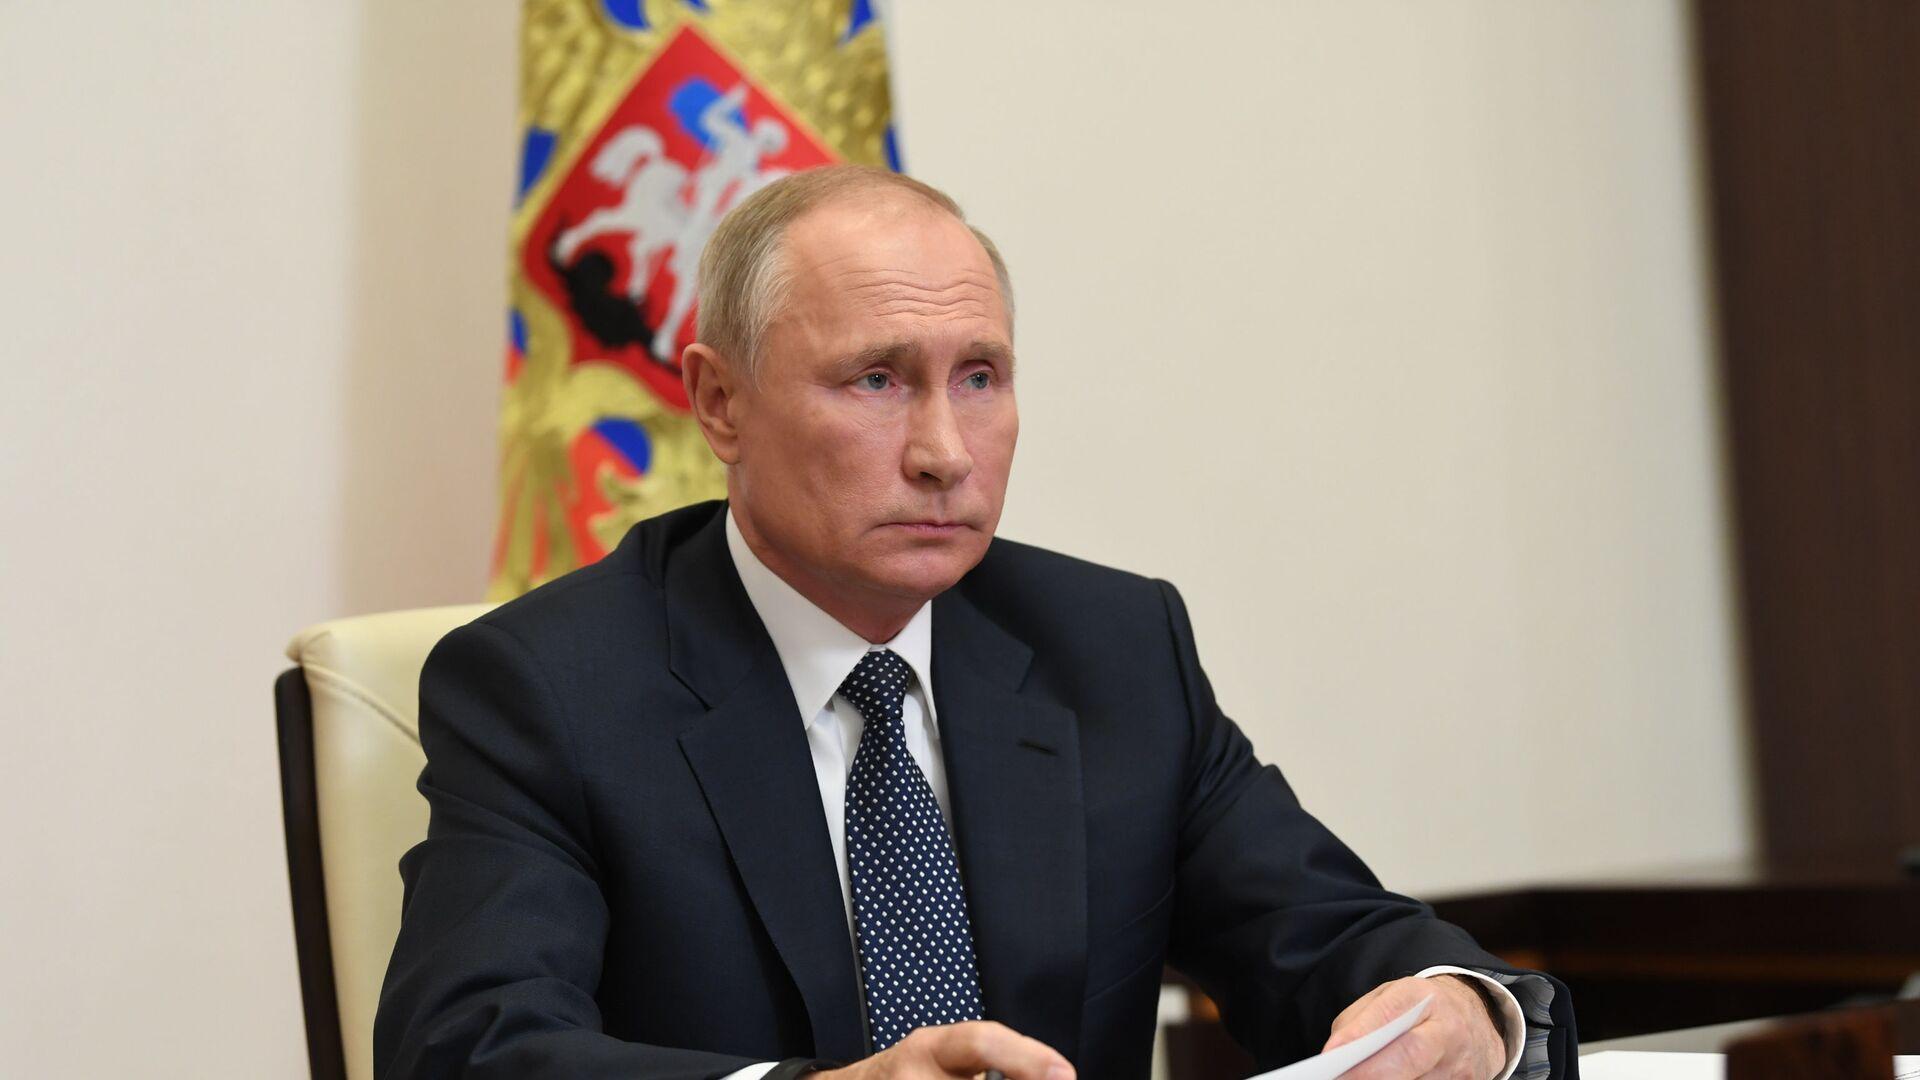 Tổng thống Nga Vladimir Putin. - Sputnik Việt Nam, 1920, 06.10.2021